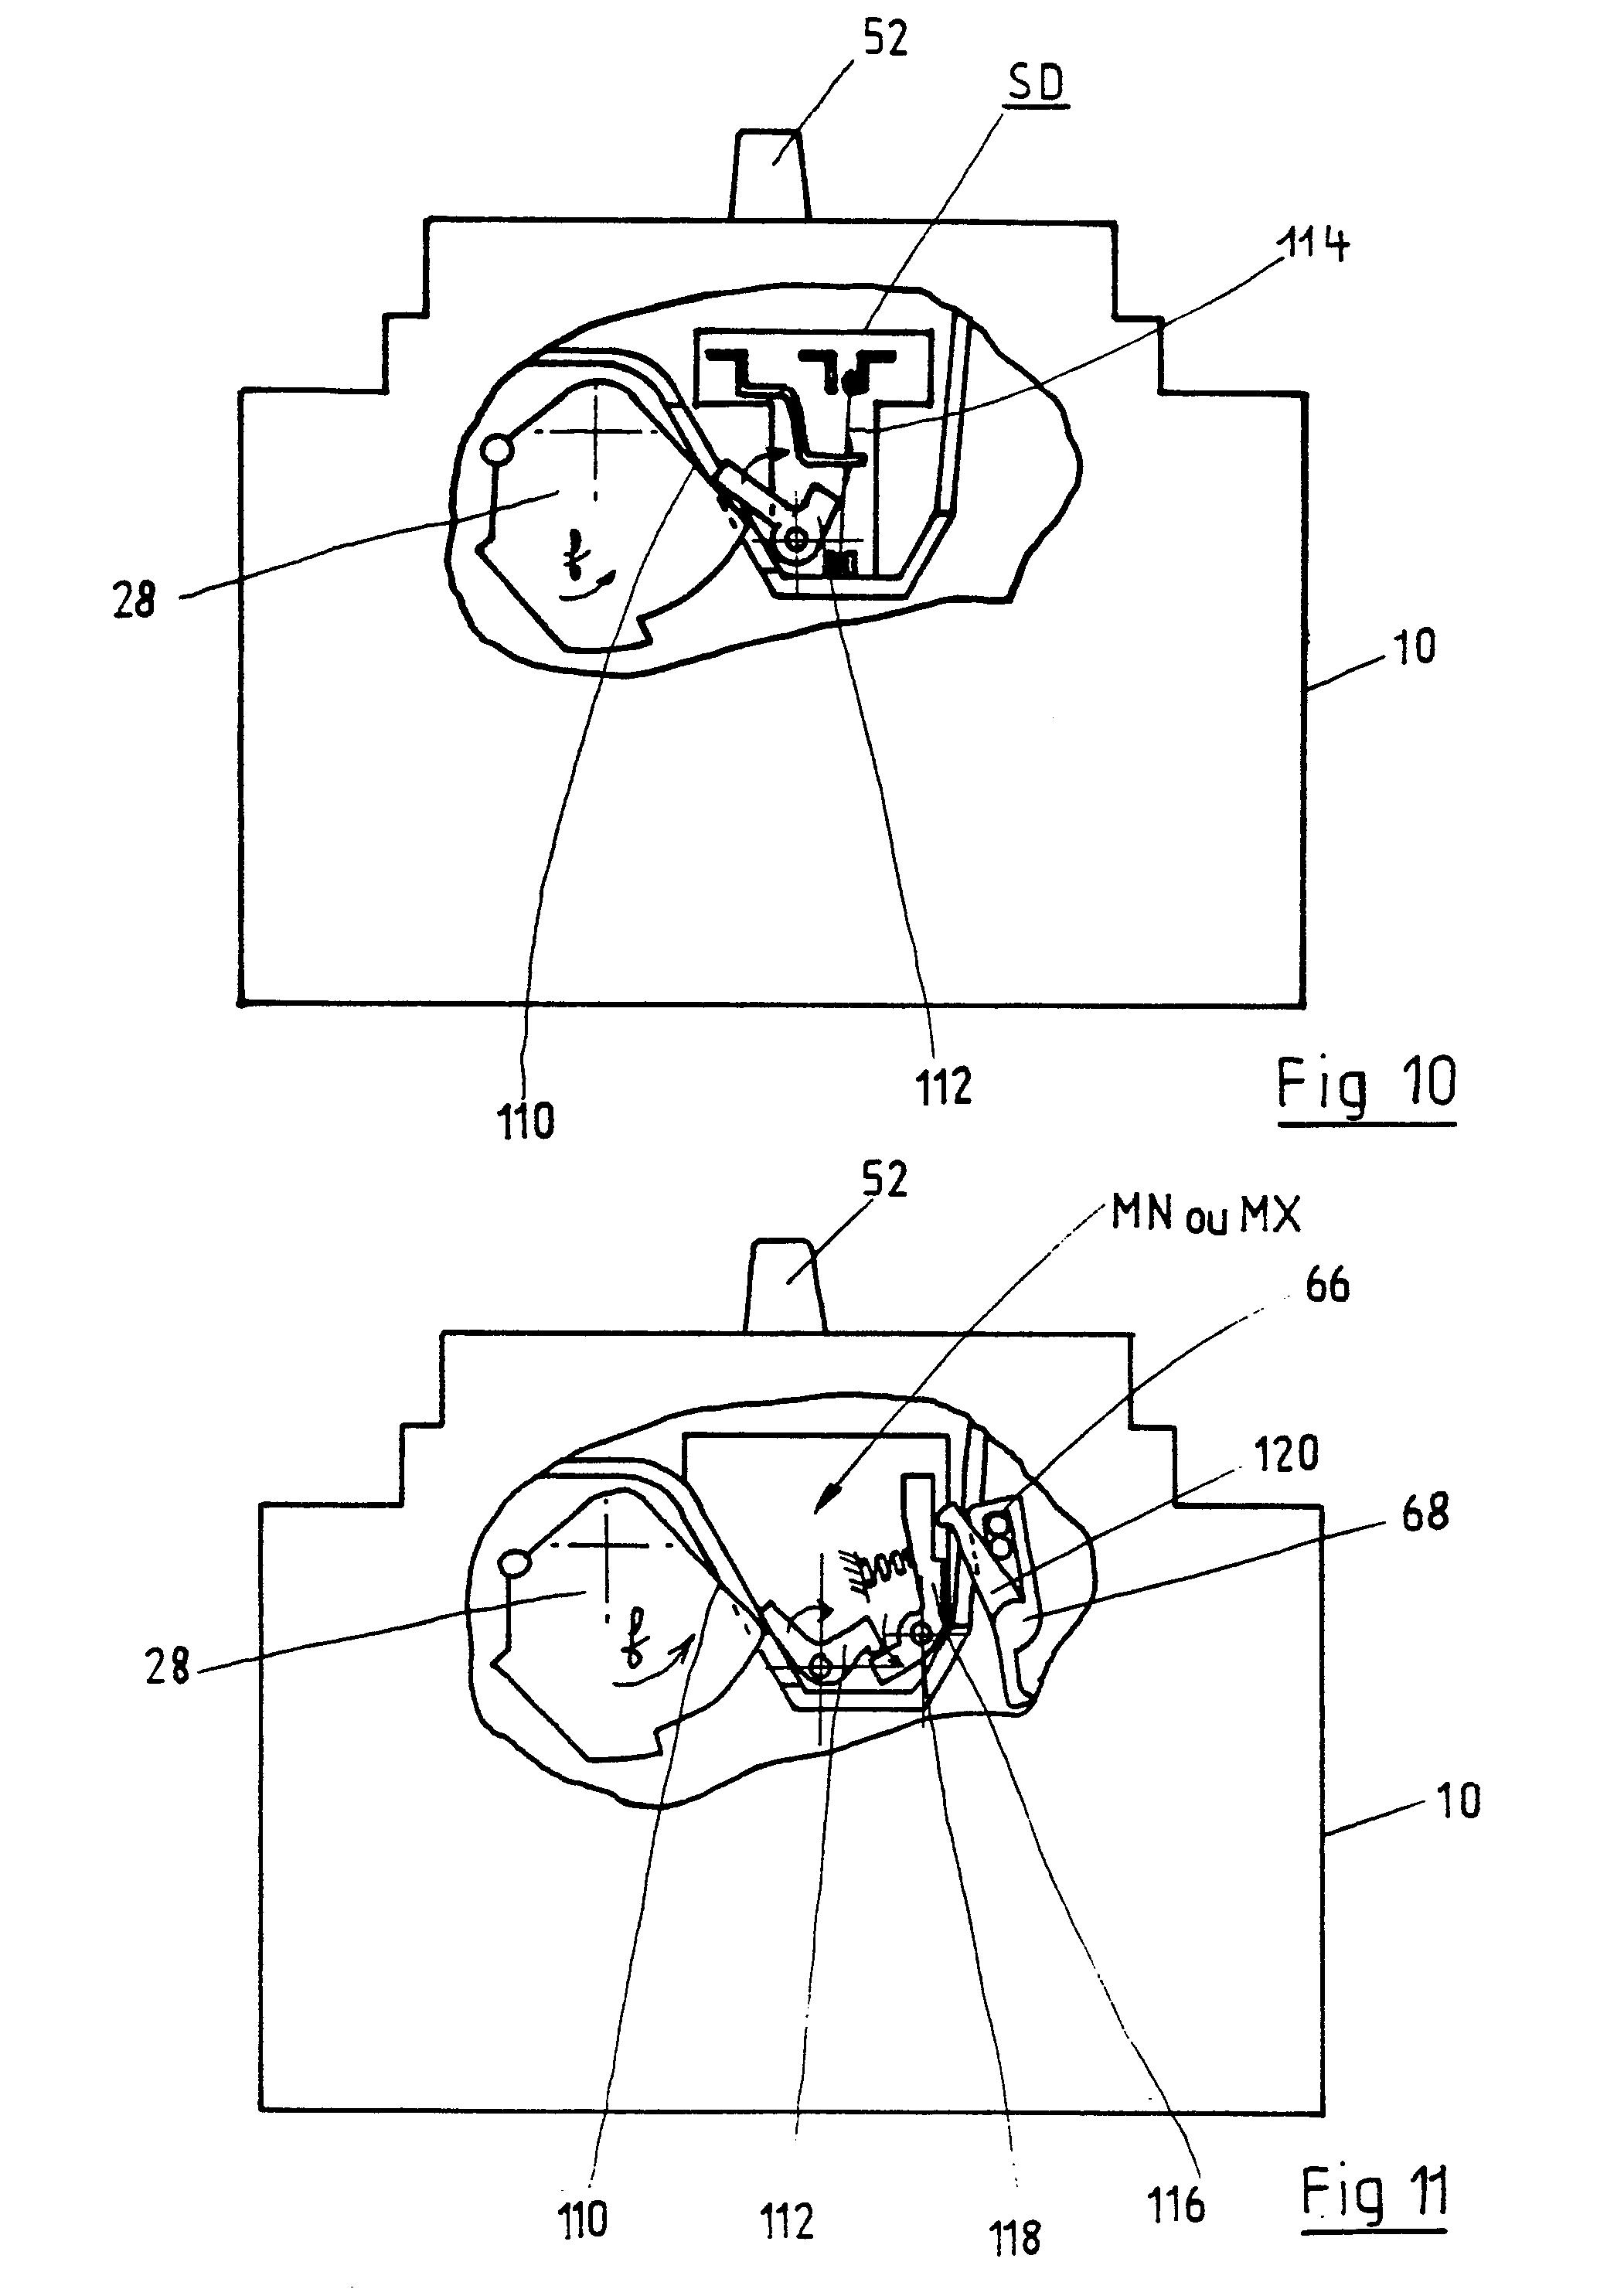 merlin gerin circuit breaker manual